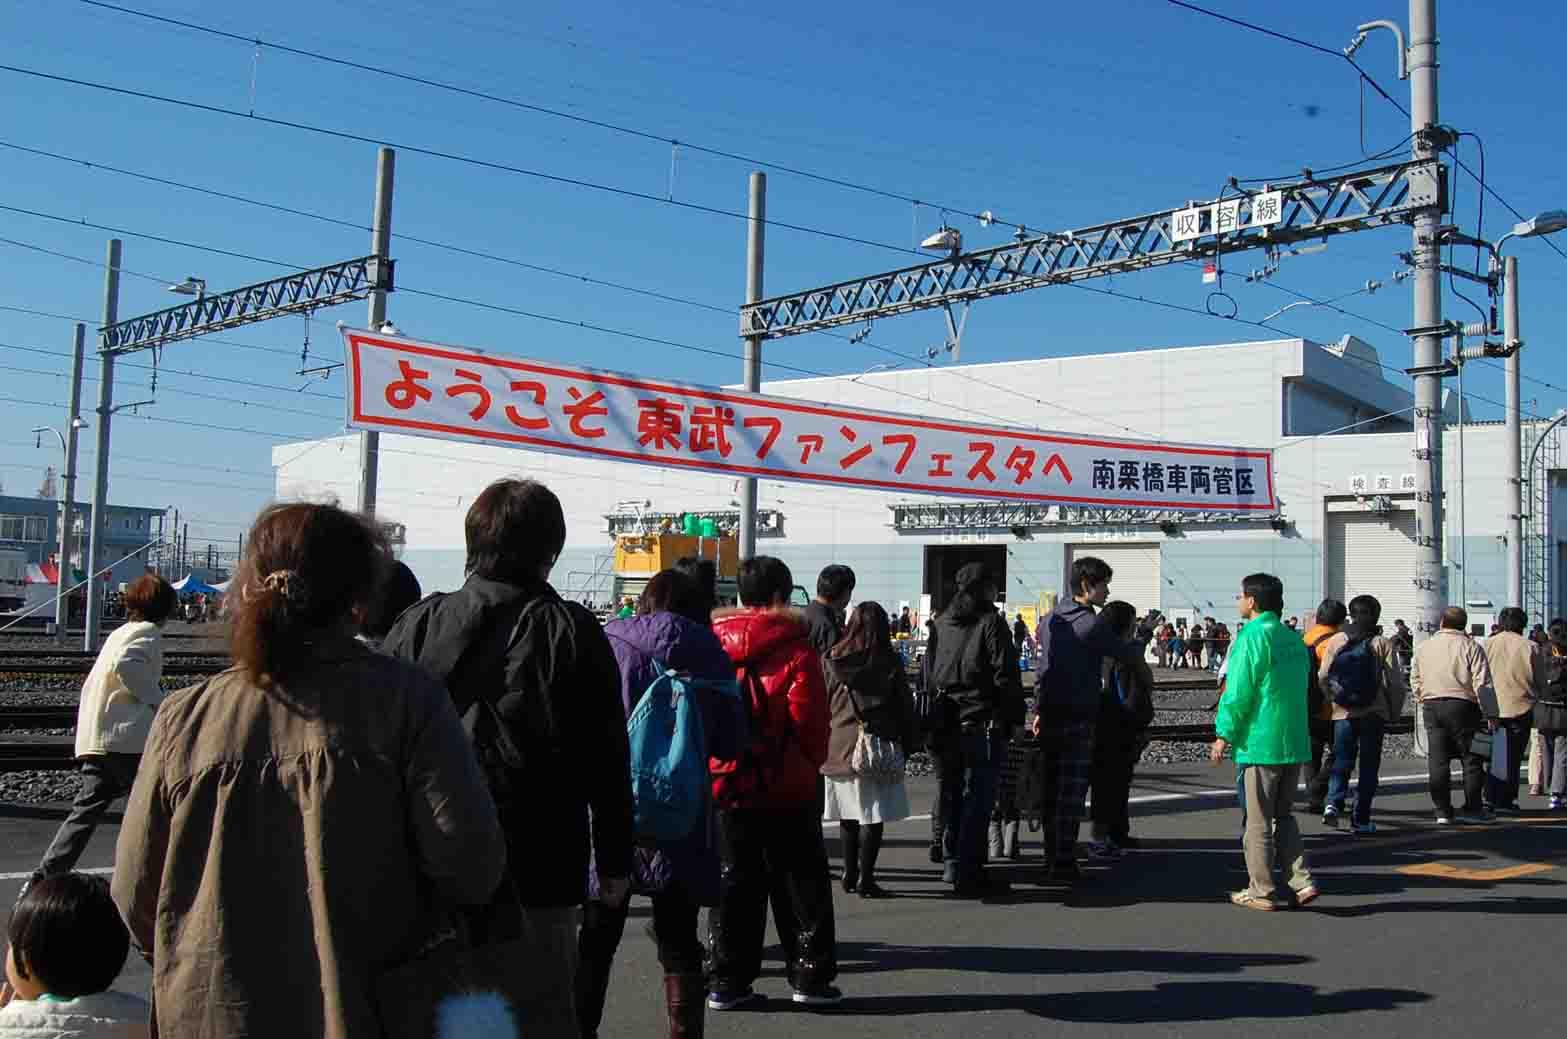 20101205南栗橋東武フェス 006A